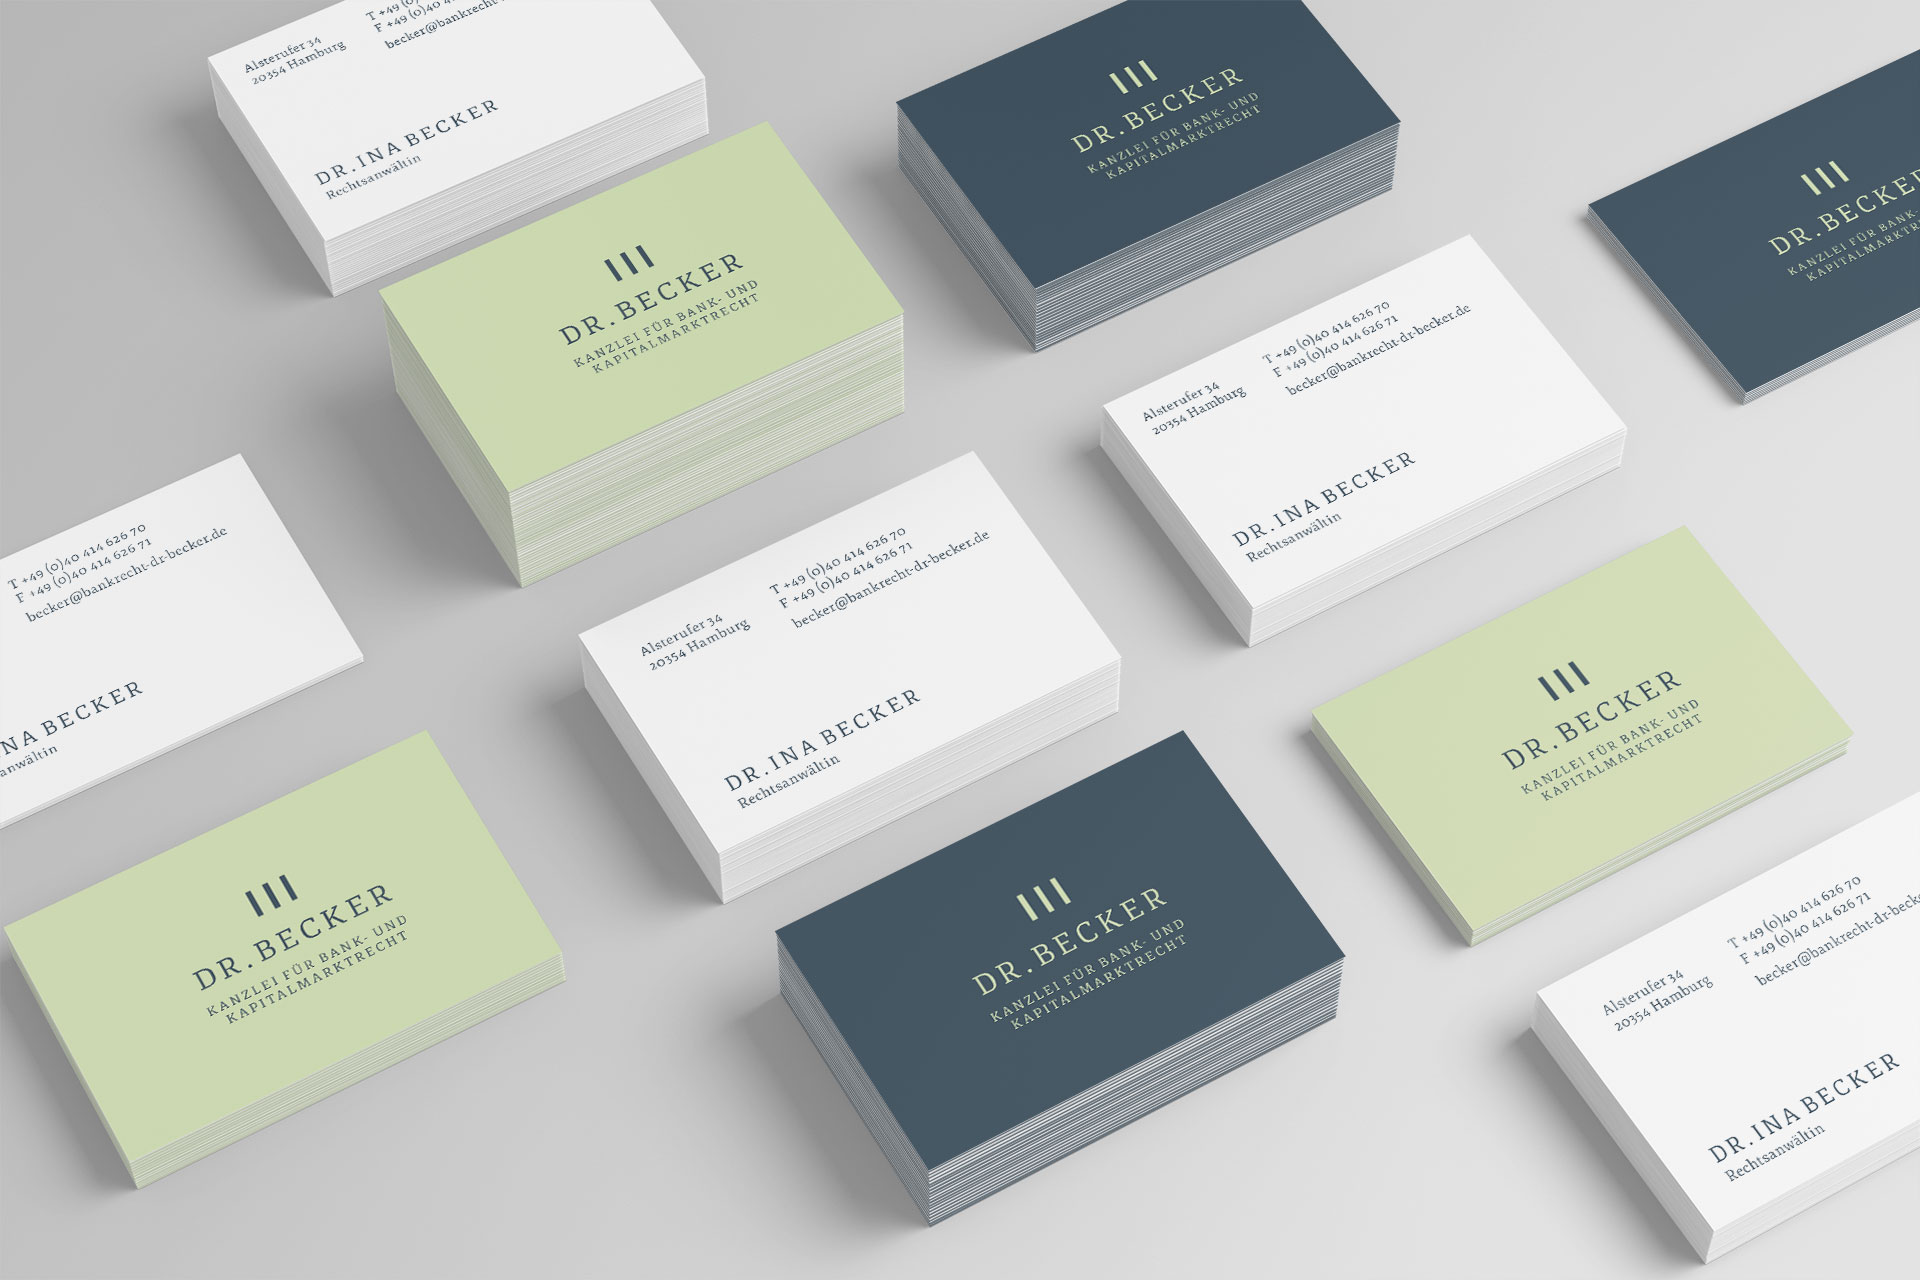 Visitenkarten im Corporate Design der Kanzlei Dr. Becker